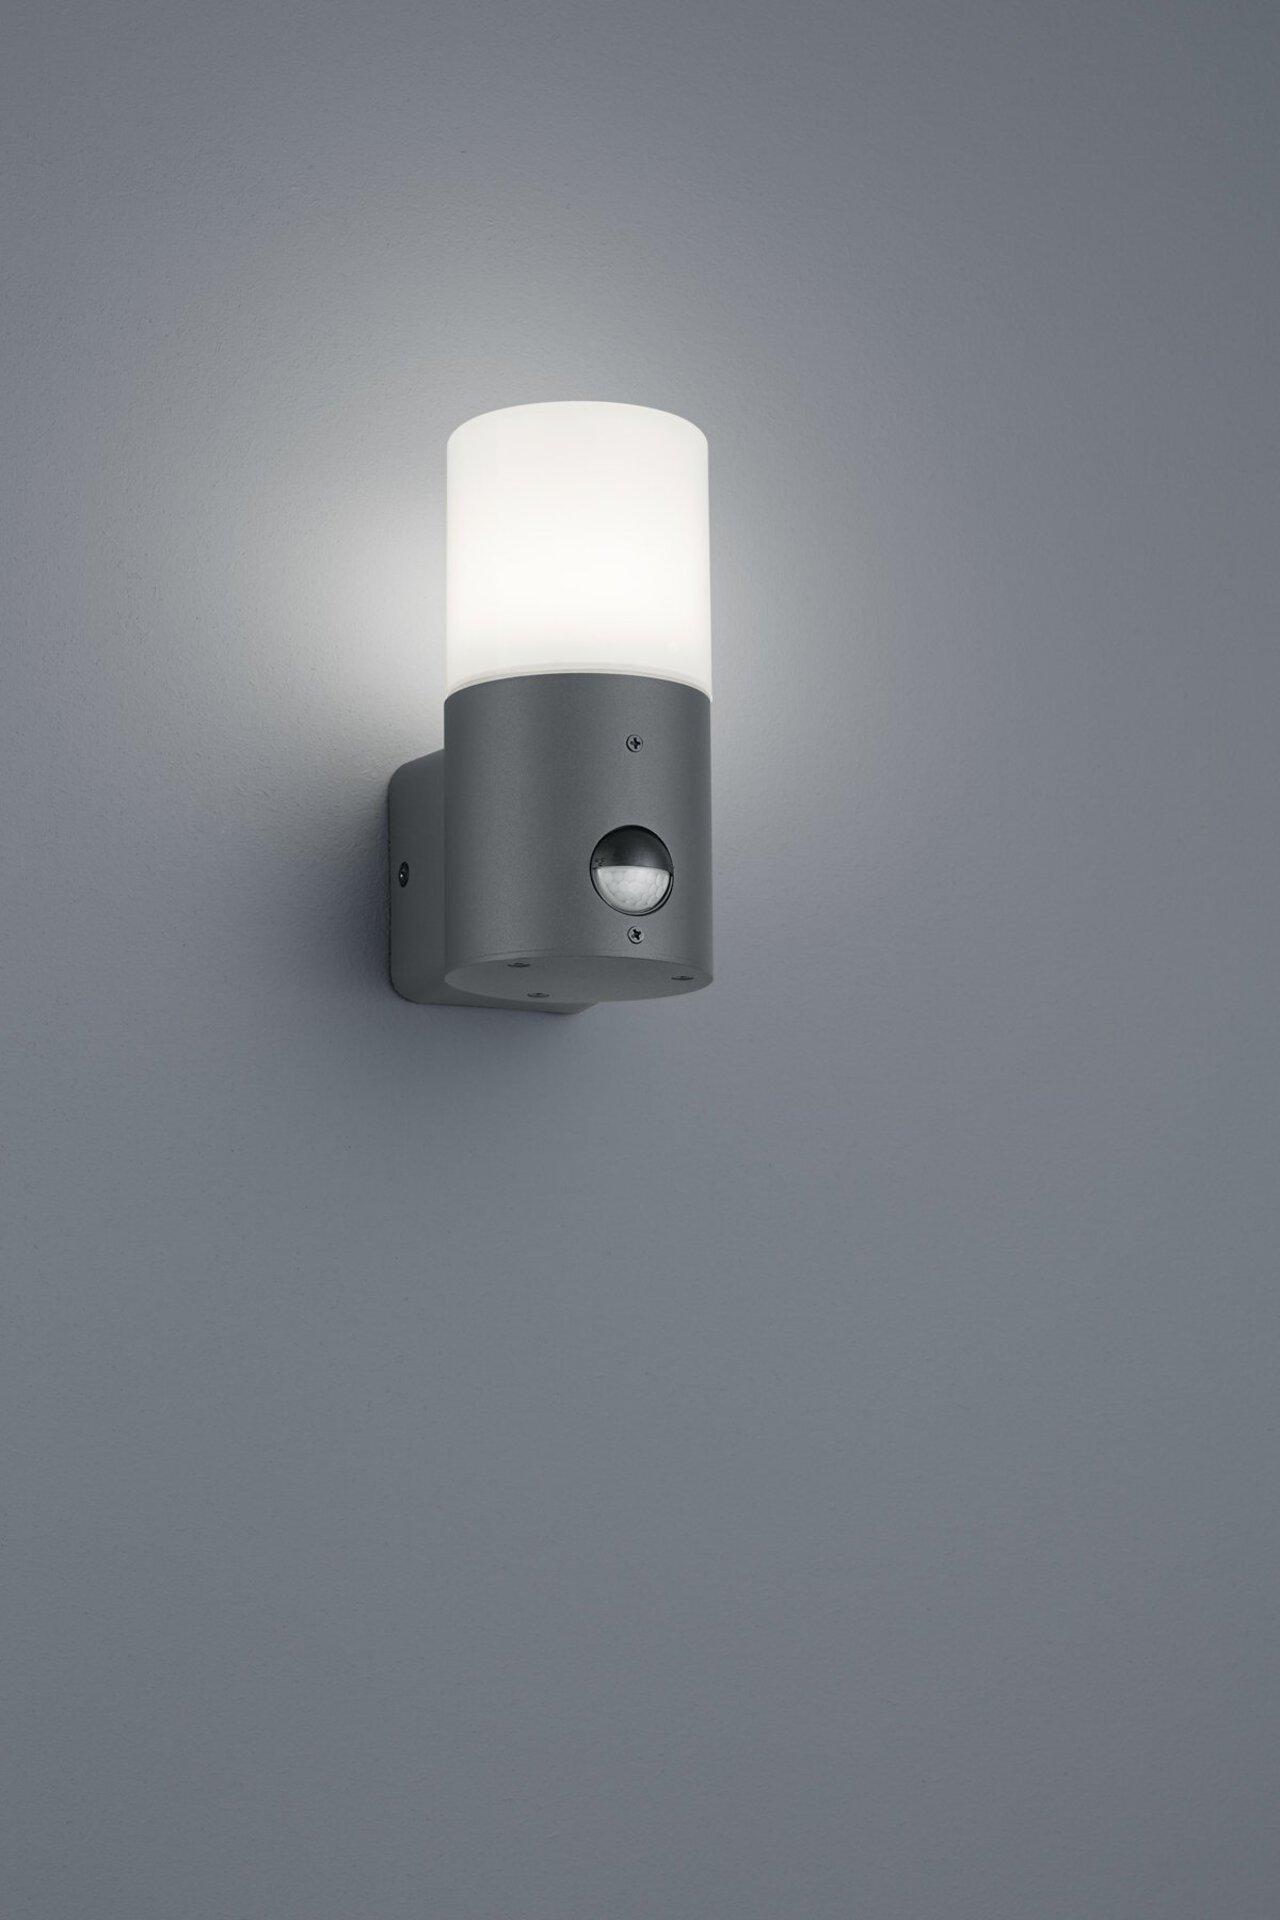 Wand-Aussenleuchte Hoosic Trio Leuchten Metall grau 9 x 18 x 12 cm